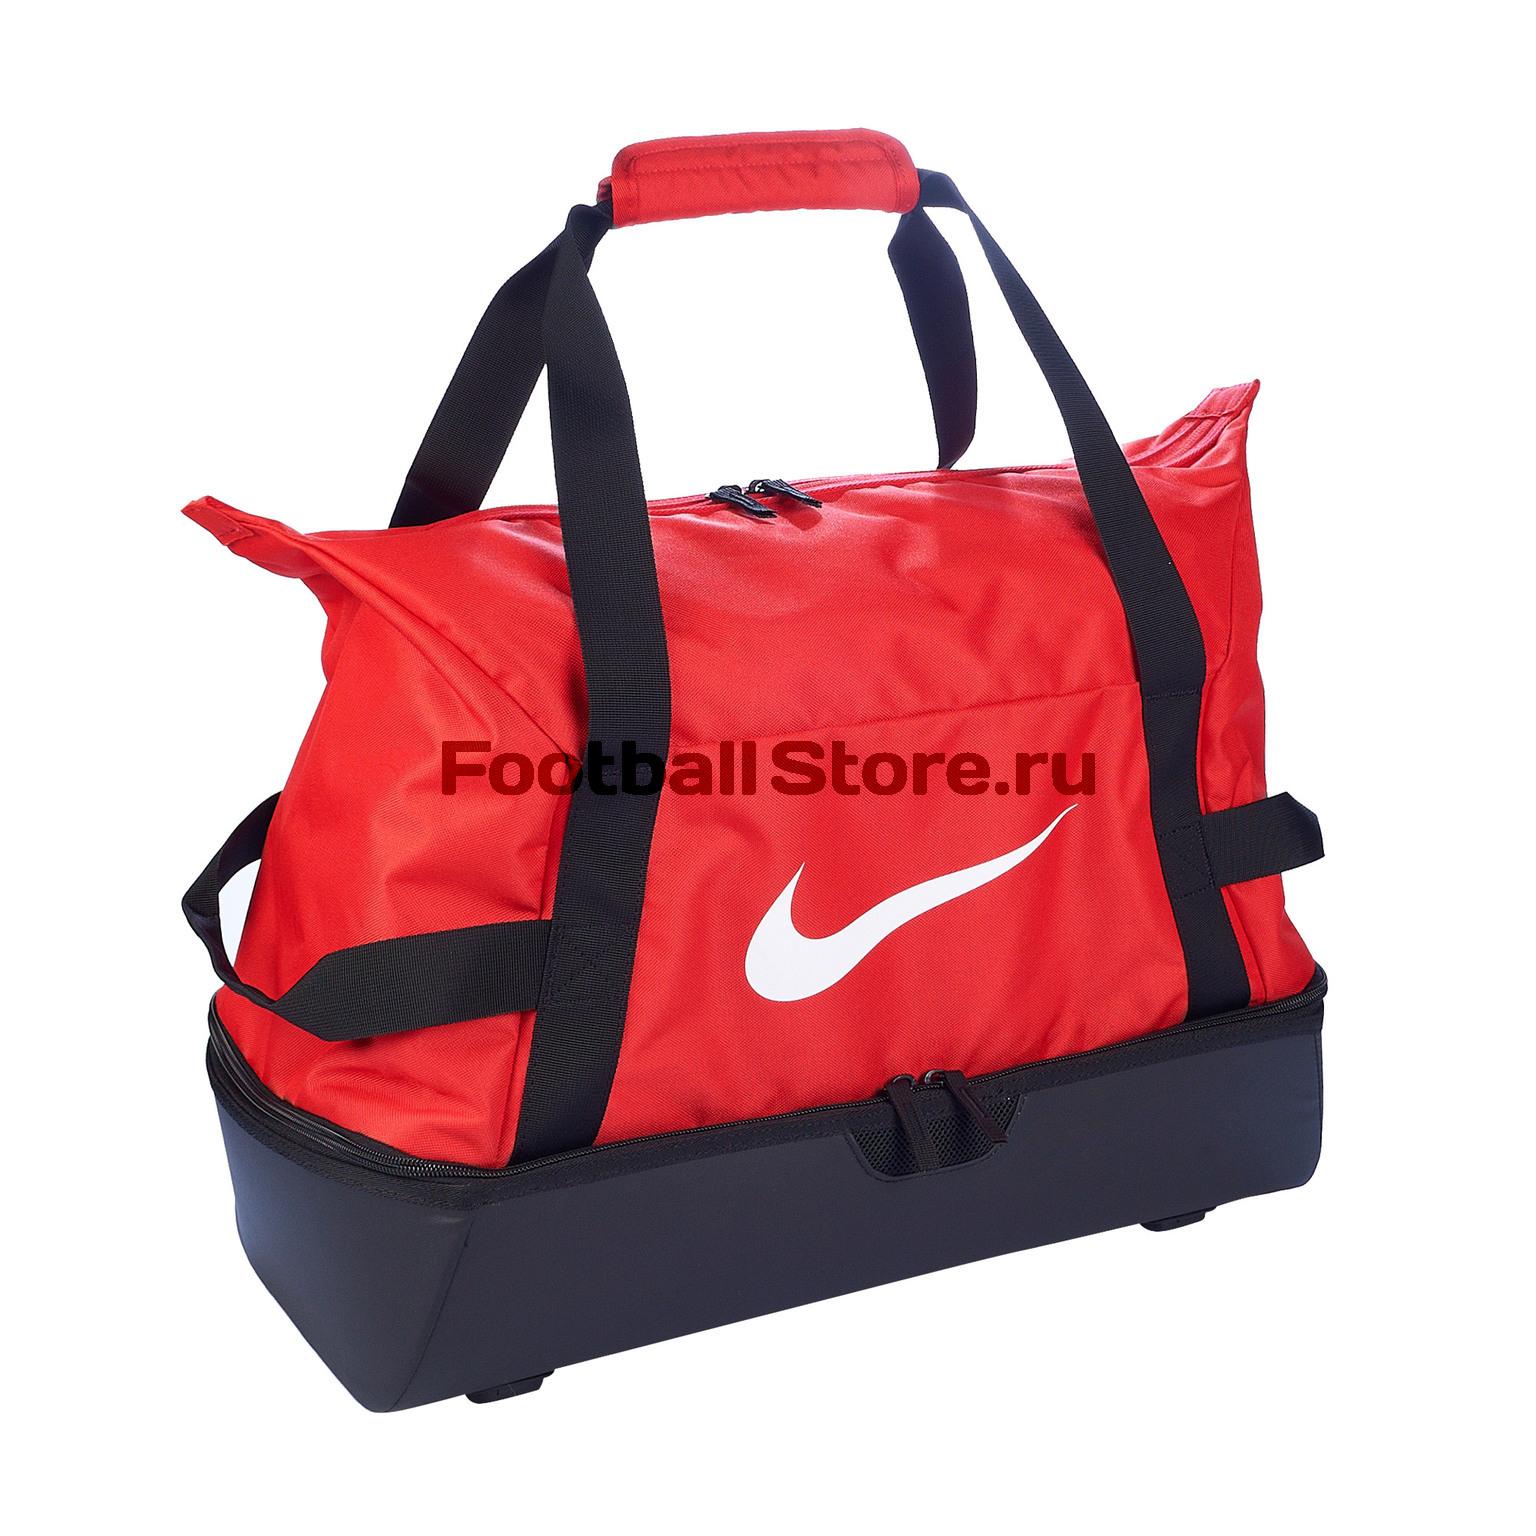 Сумка Nike Academy Team L HDCS BA5506-657 сумка nike academy team l ba5506 410